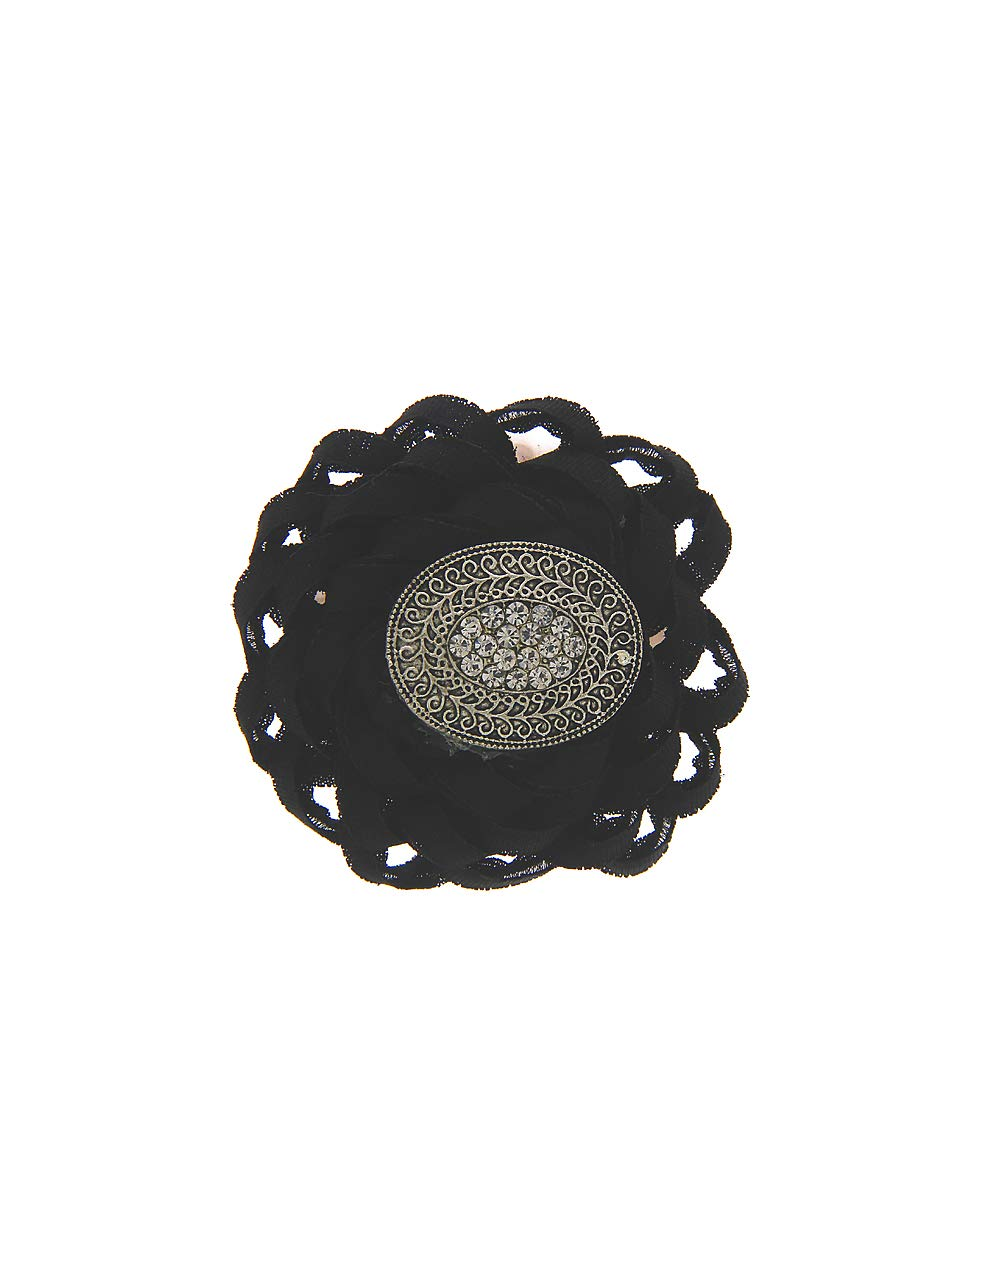 Anuradha Art Black Colour Designer Classy Wonderful Sari/Saree Pin for Women/Girls